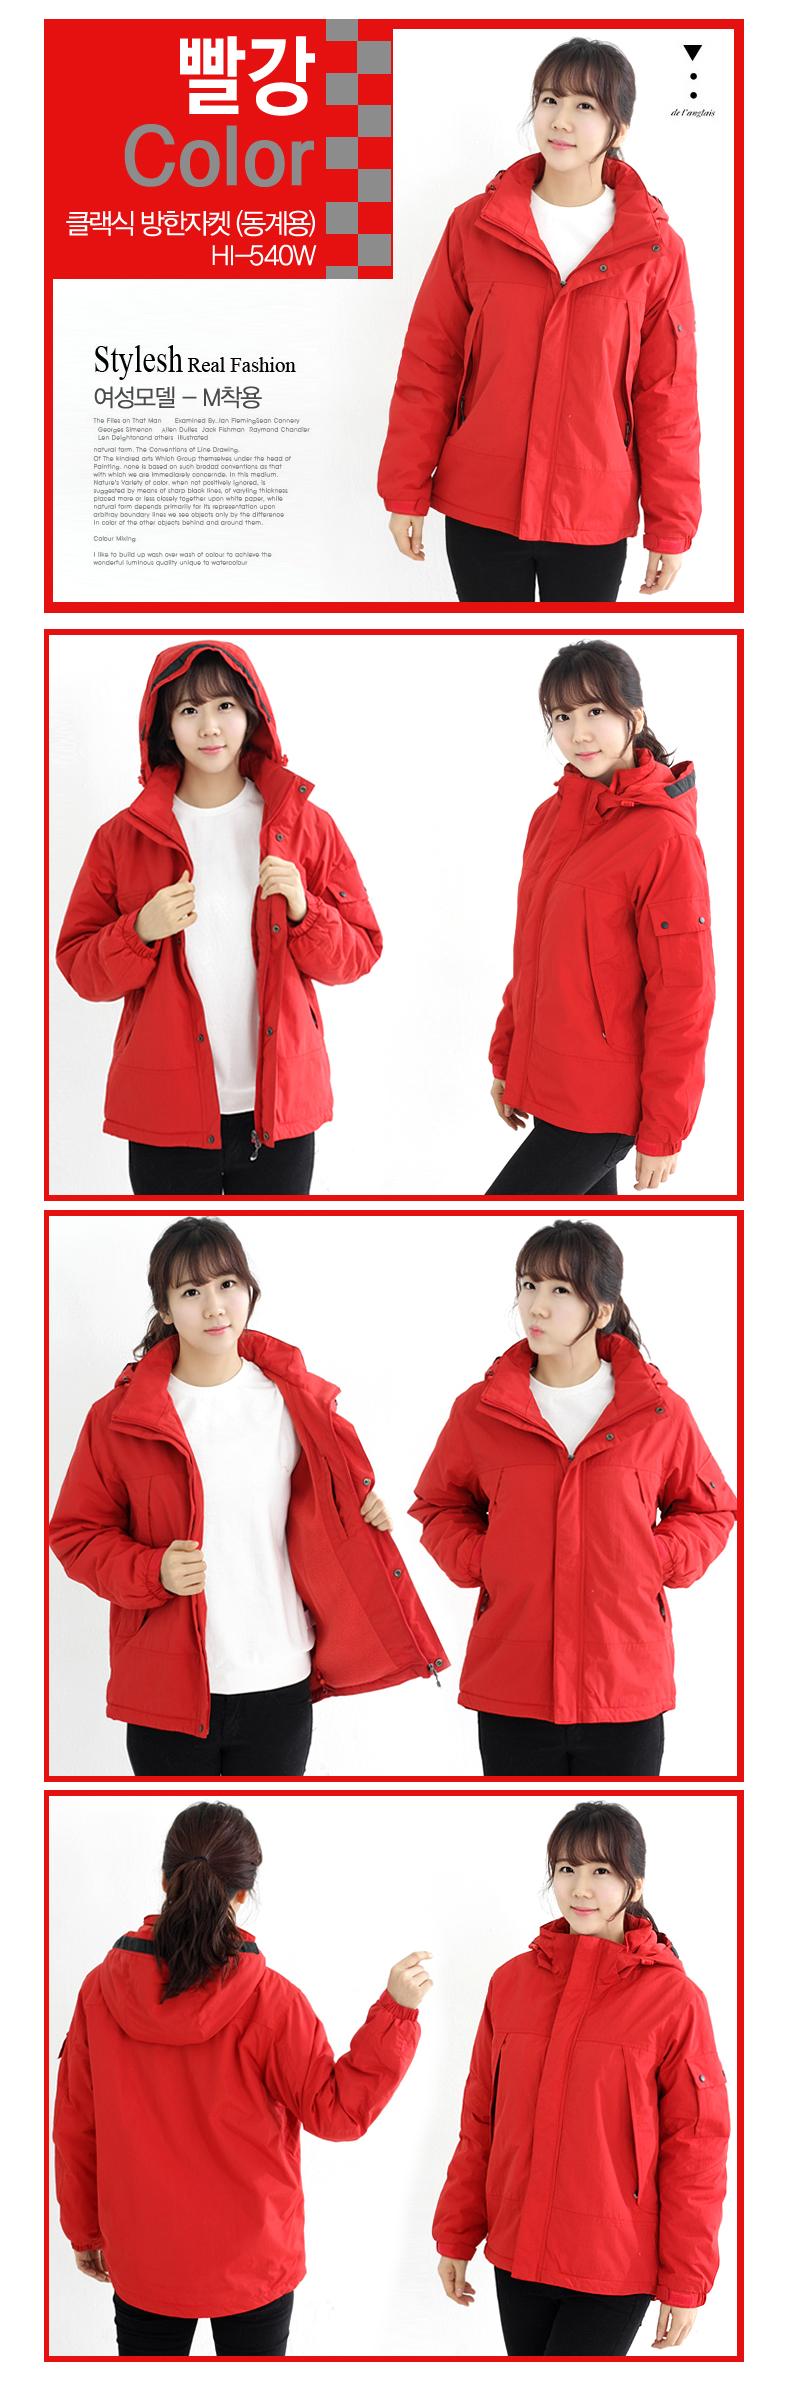 JK540W-red.jpg